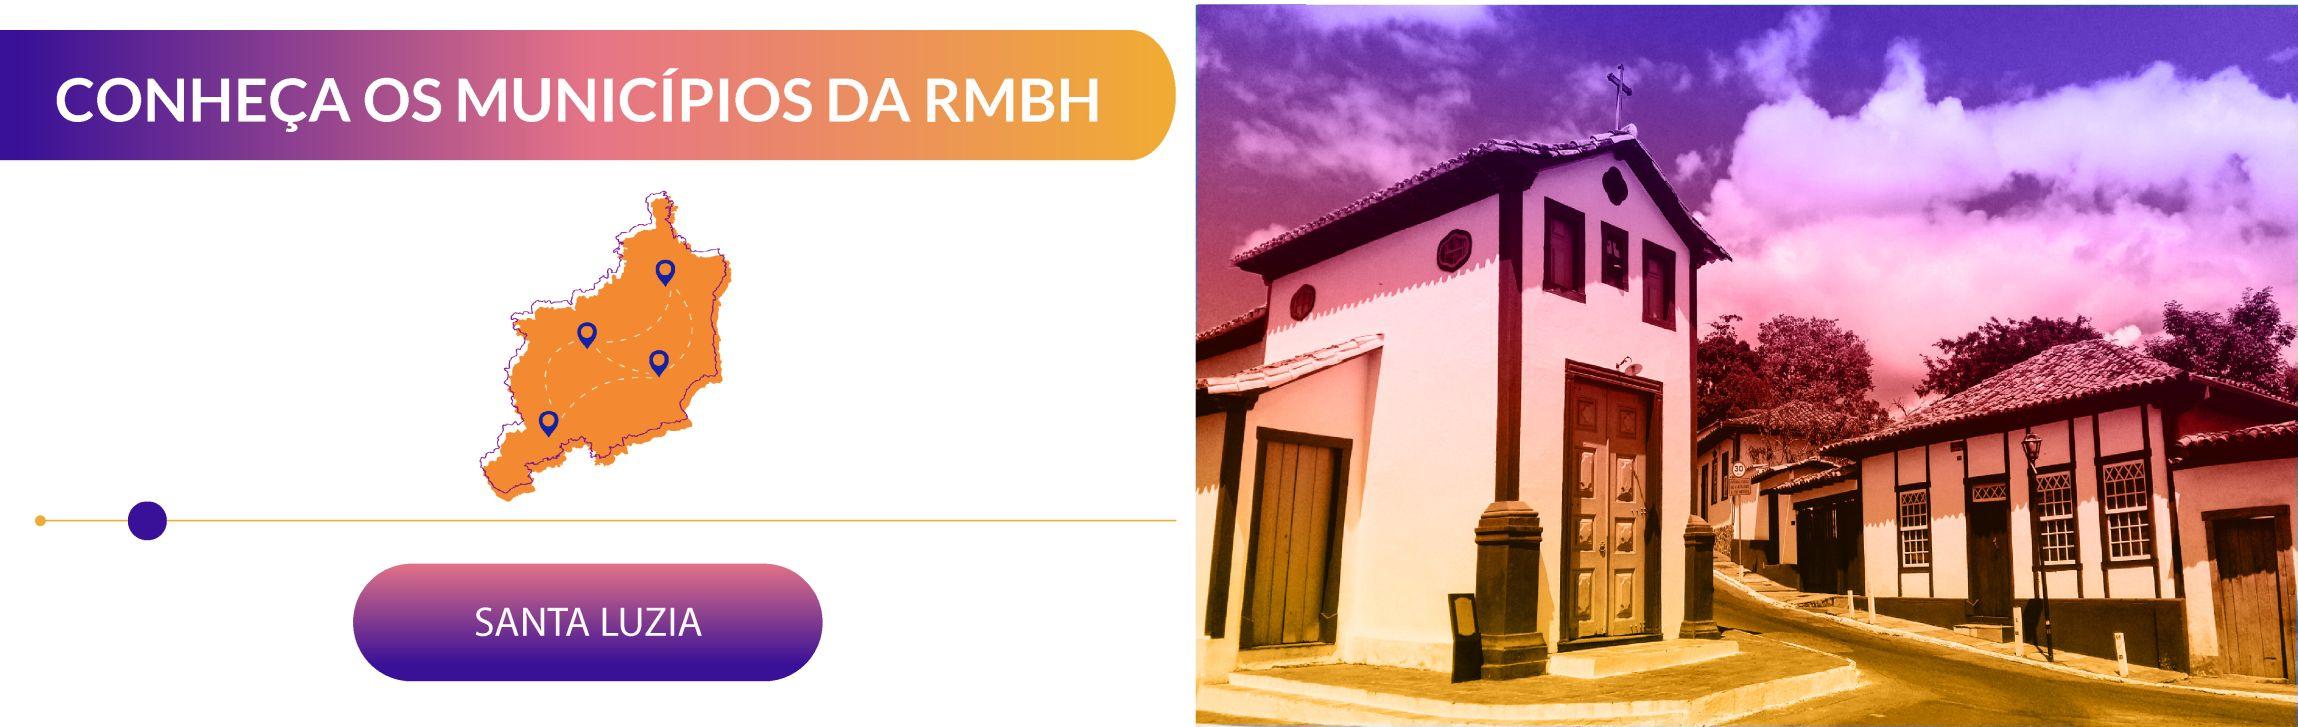 banner-municipio-santaluzia-01